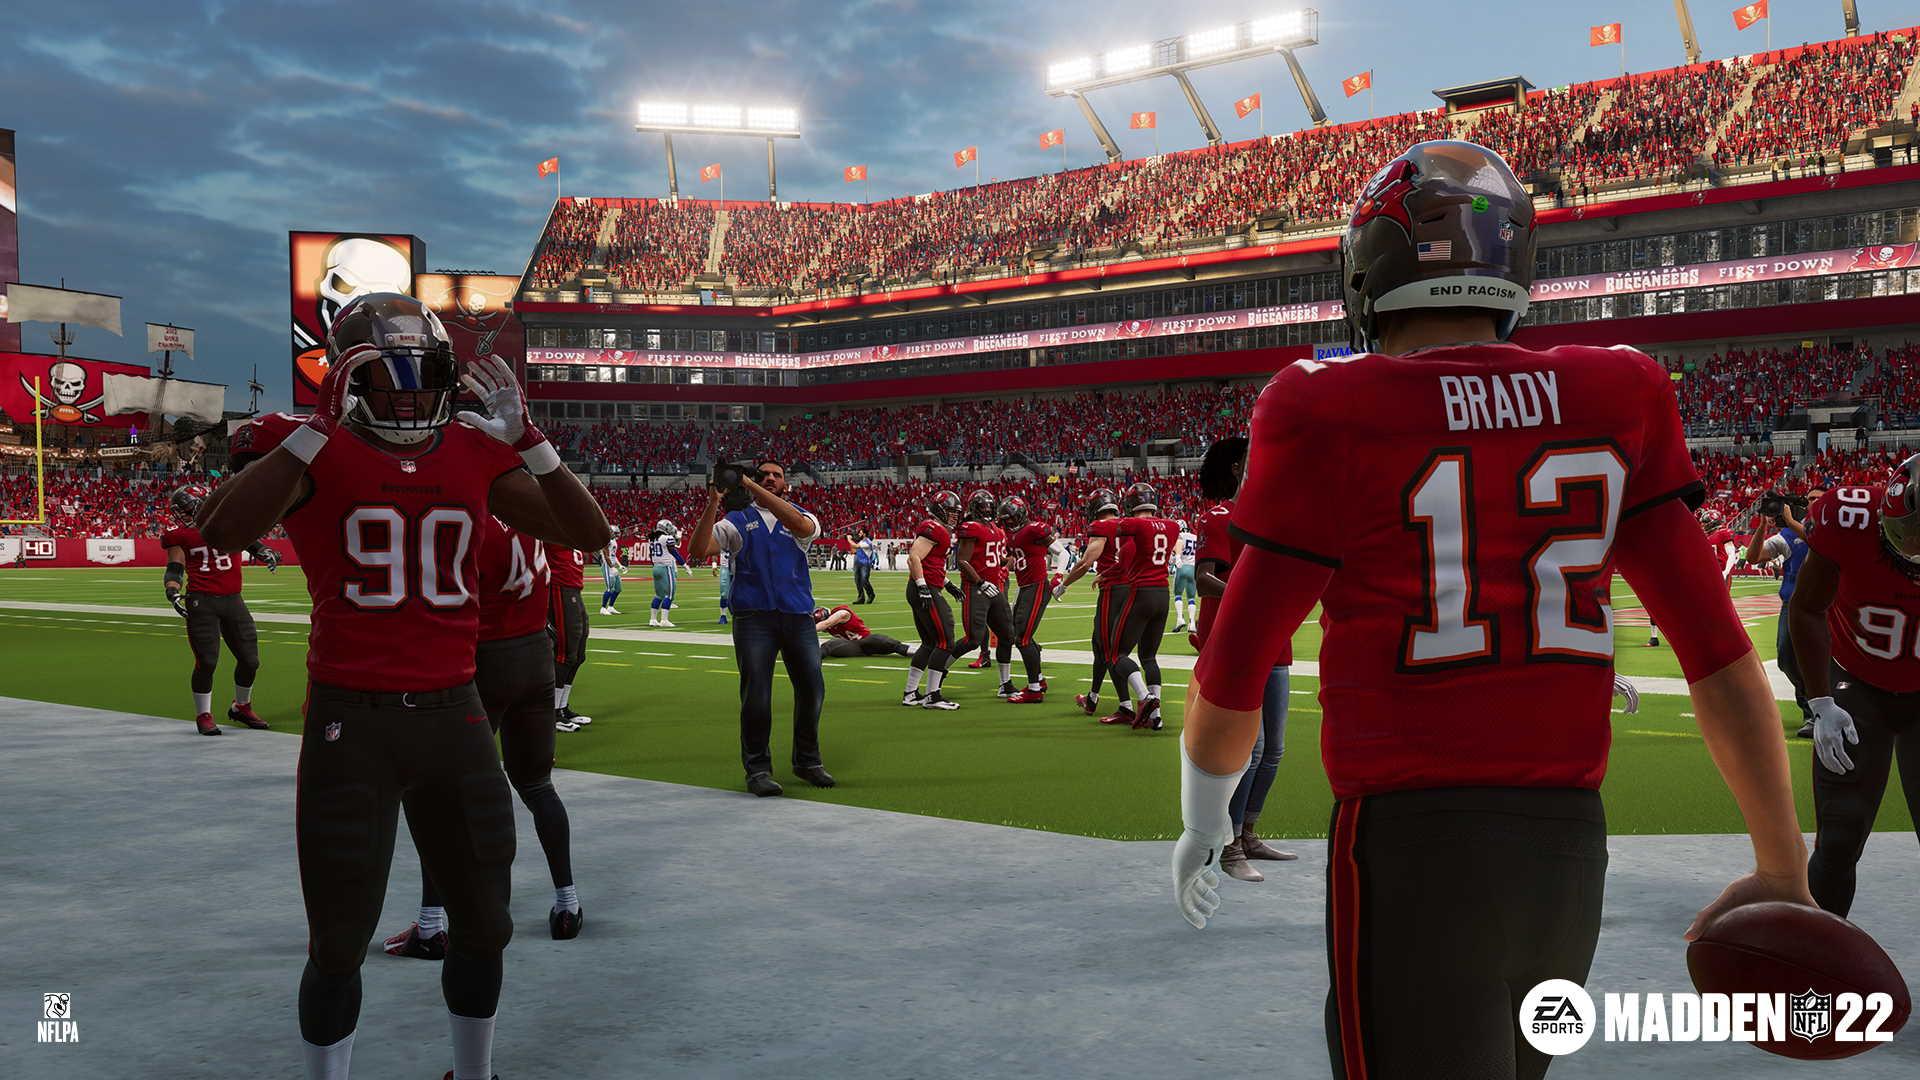 Madden NFL 22: core gameplay